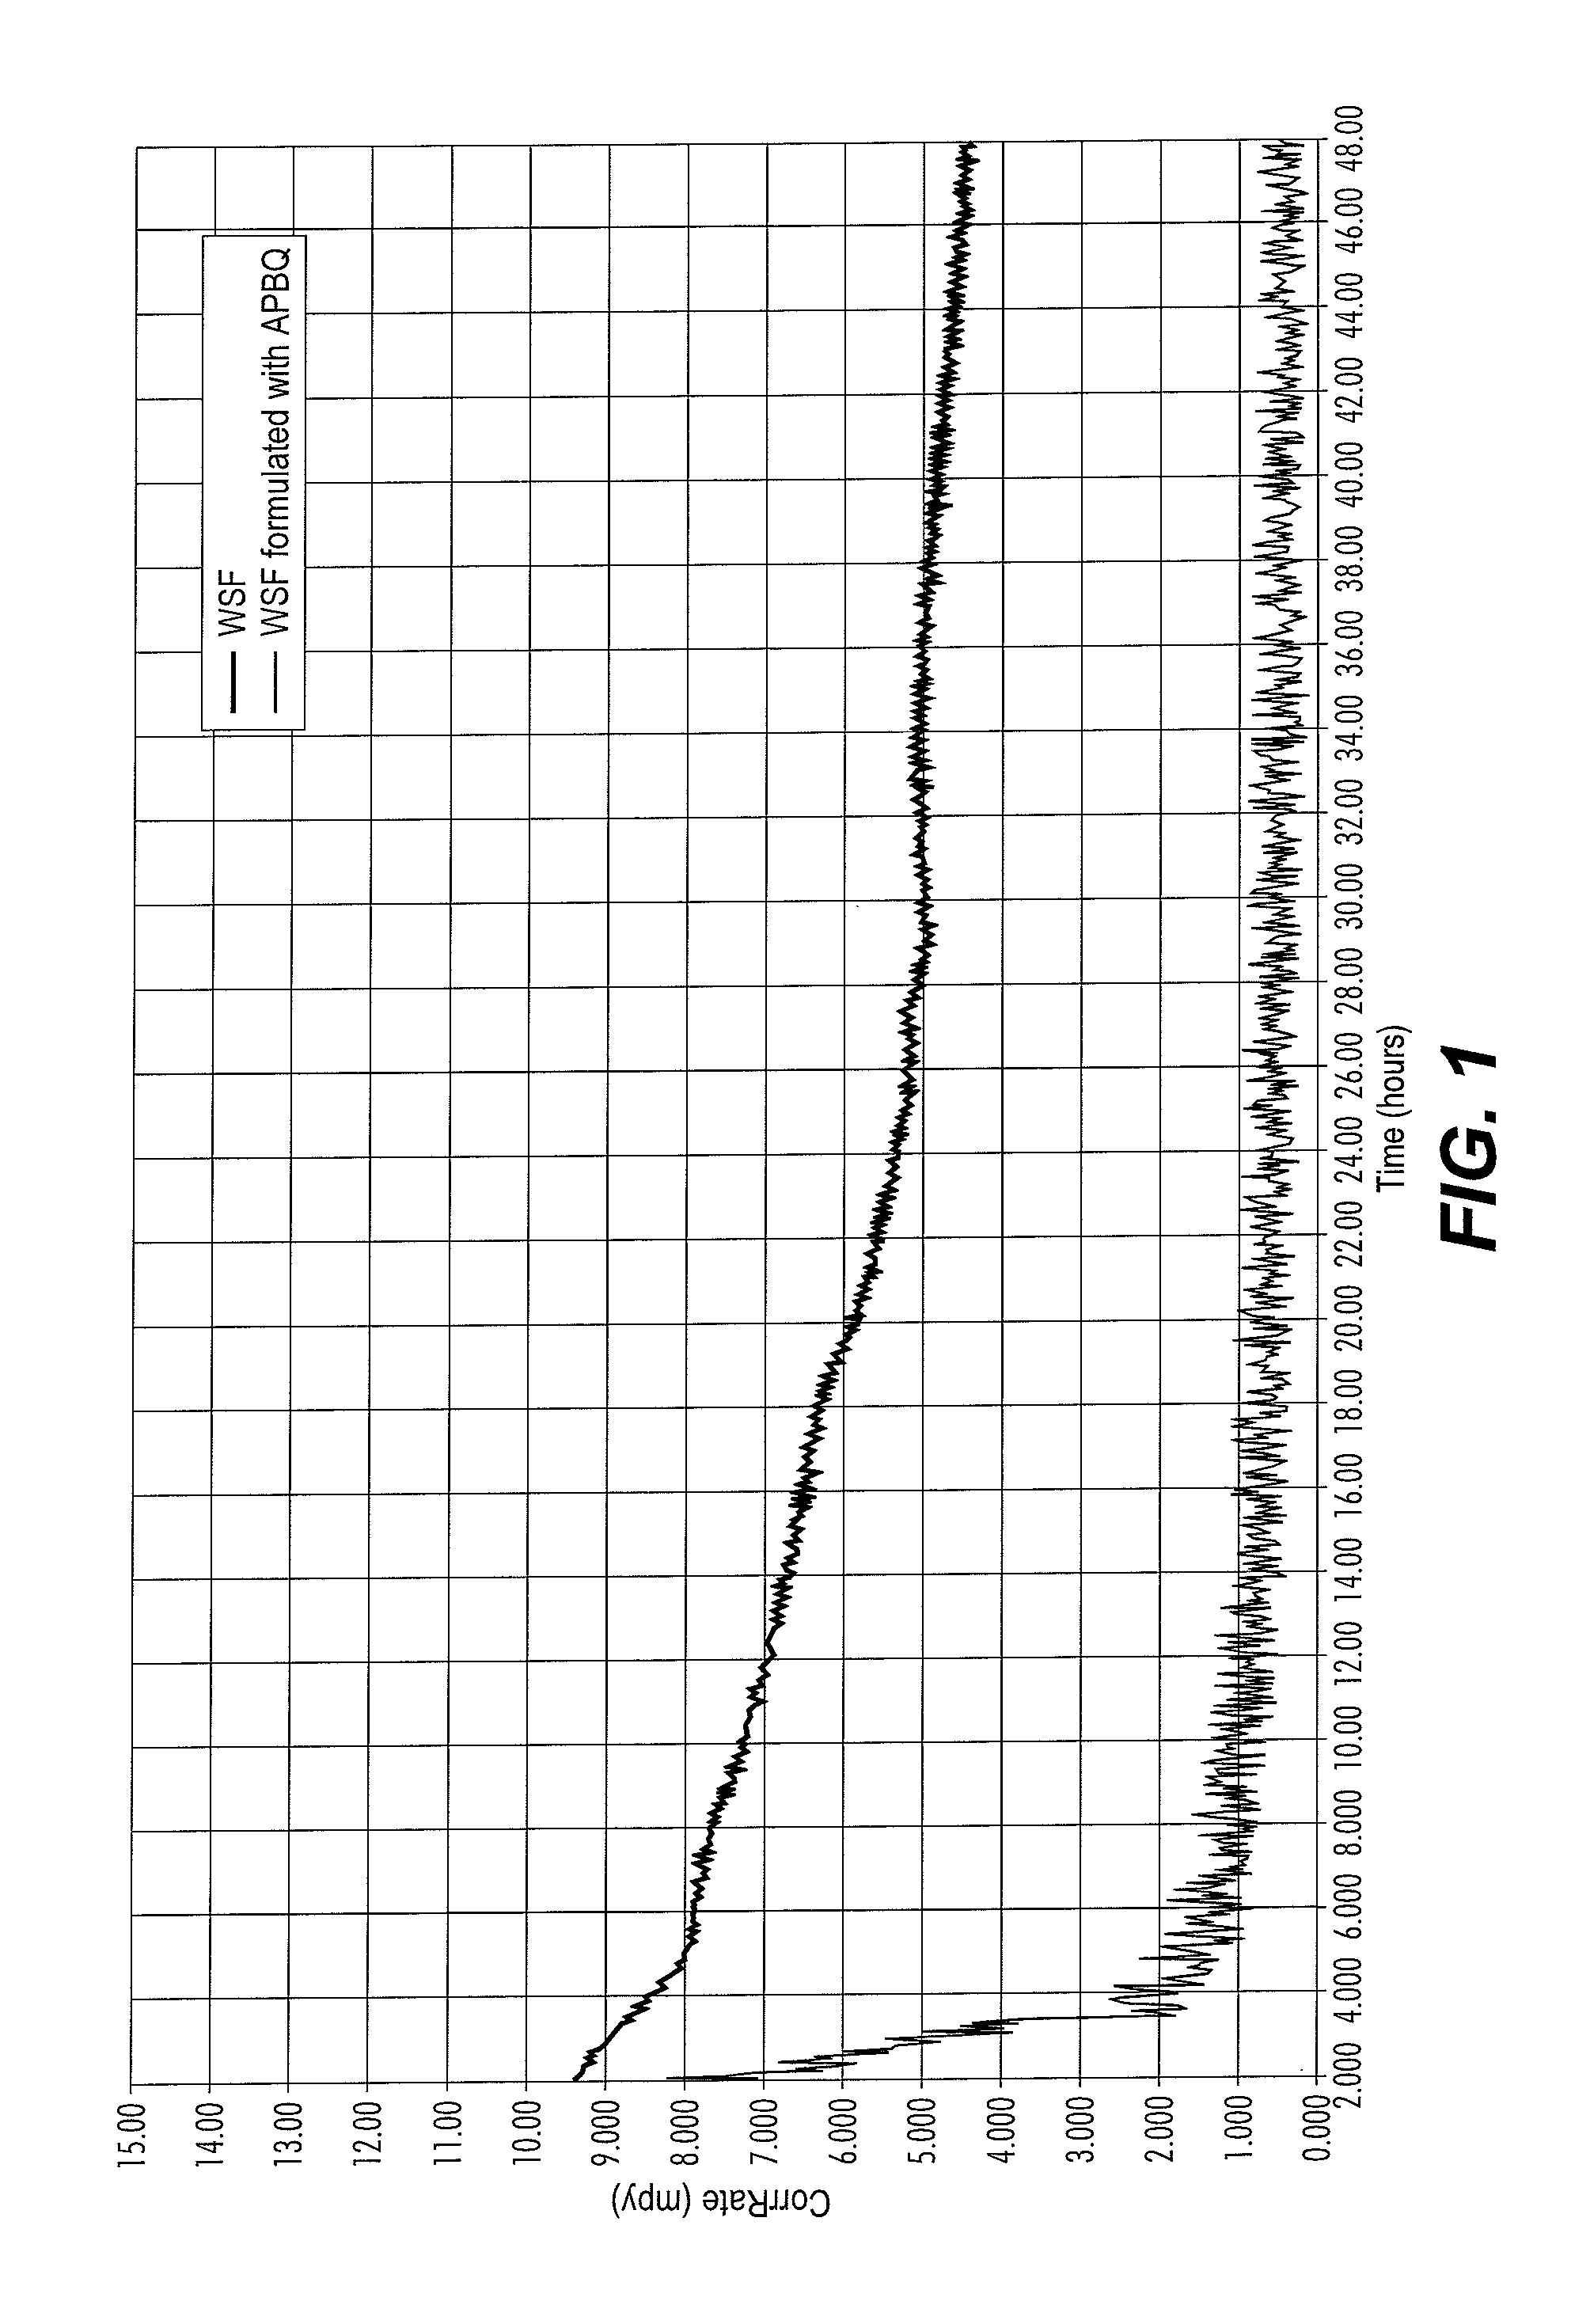 mono quaternary aminosteroid